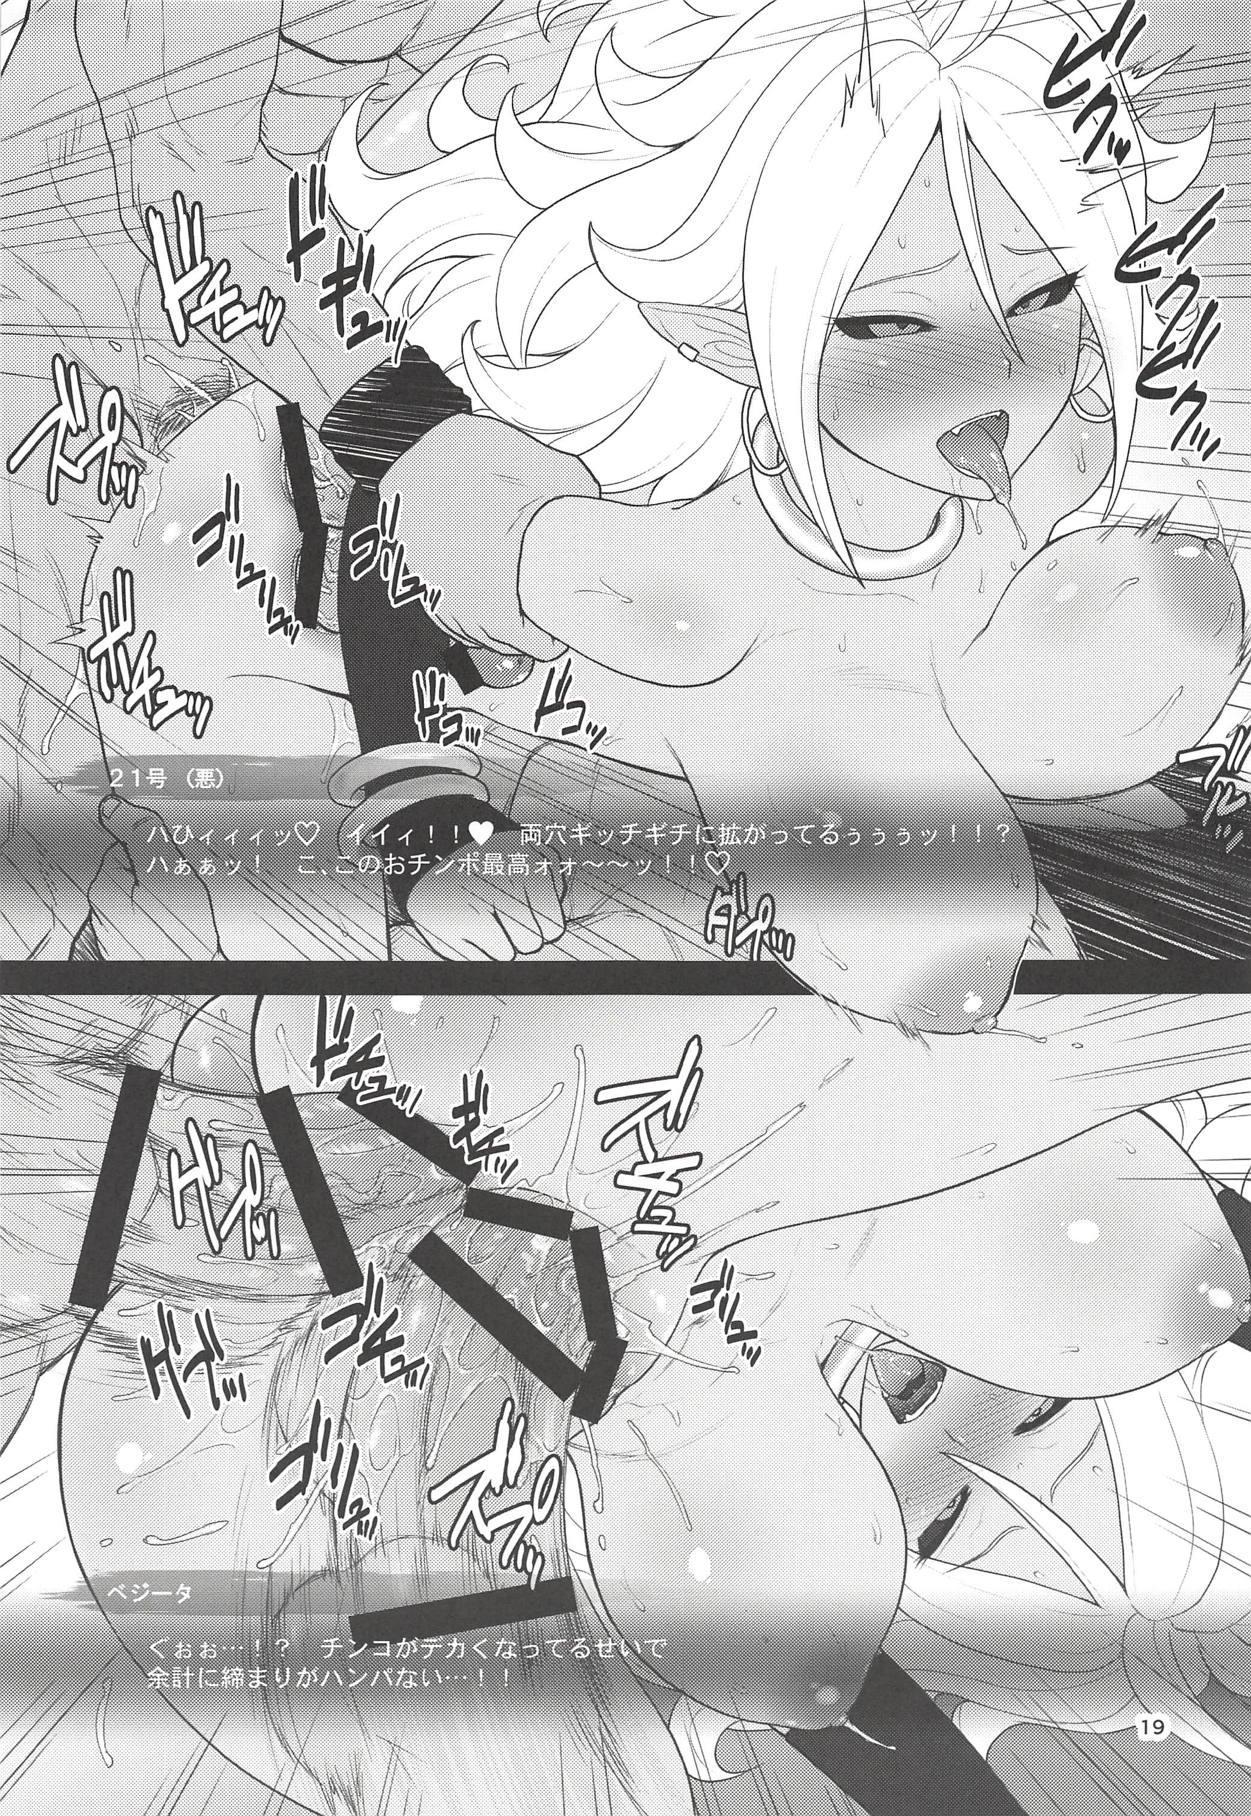 (C94) [Shinnihon Pepsitou (St.germain-sal)] 1-tsubu de 2-do Oishii (Dragon Ball FighterZ) 17